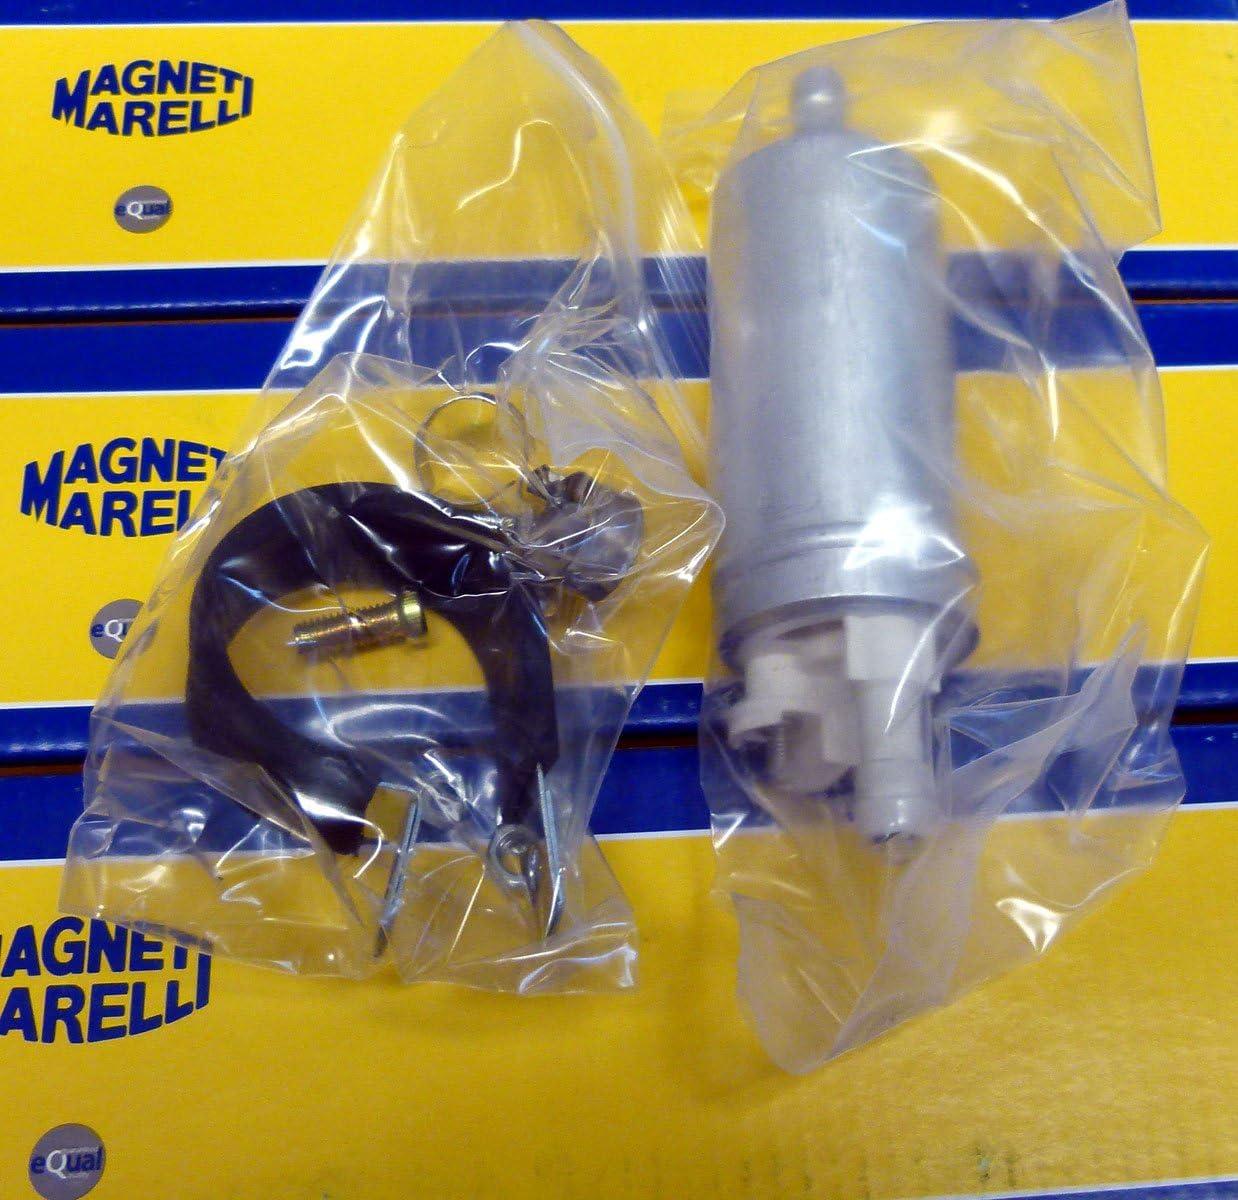 MAGNETI MARELLI 313011300008 Einspritzpumpen